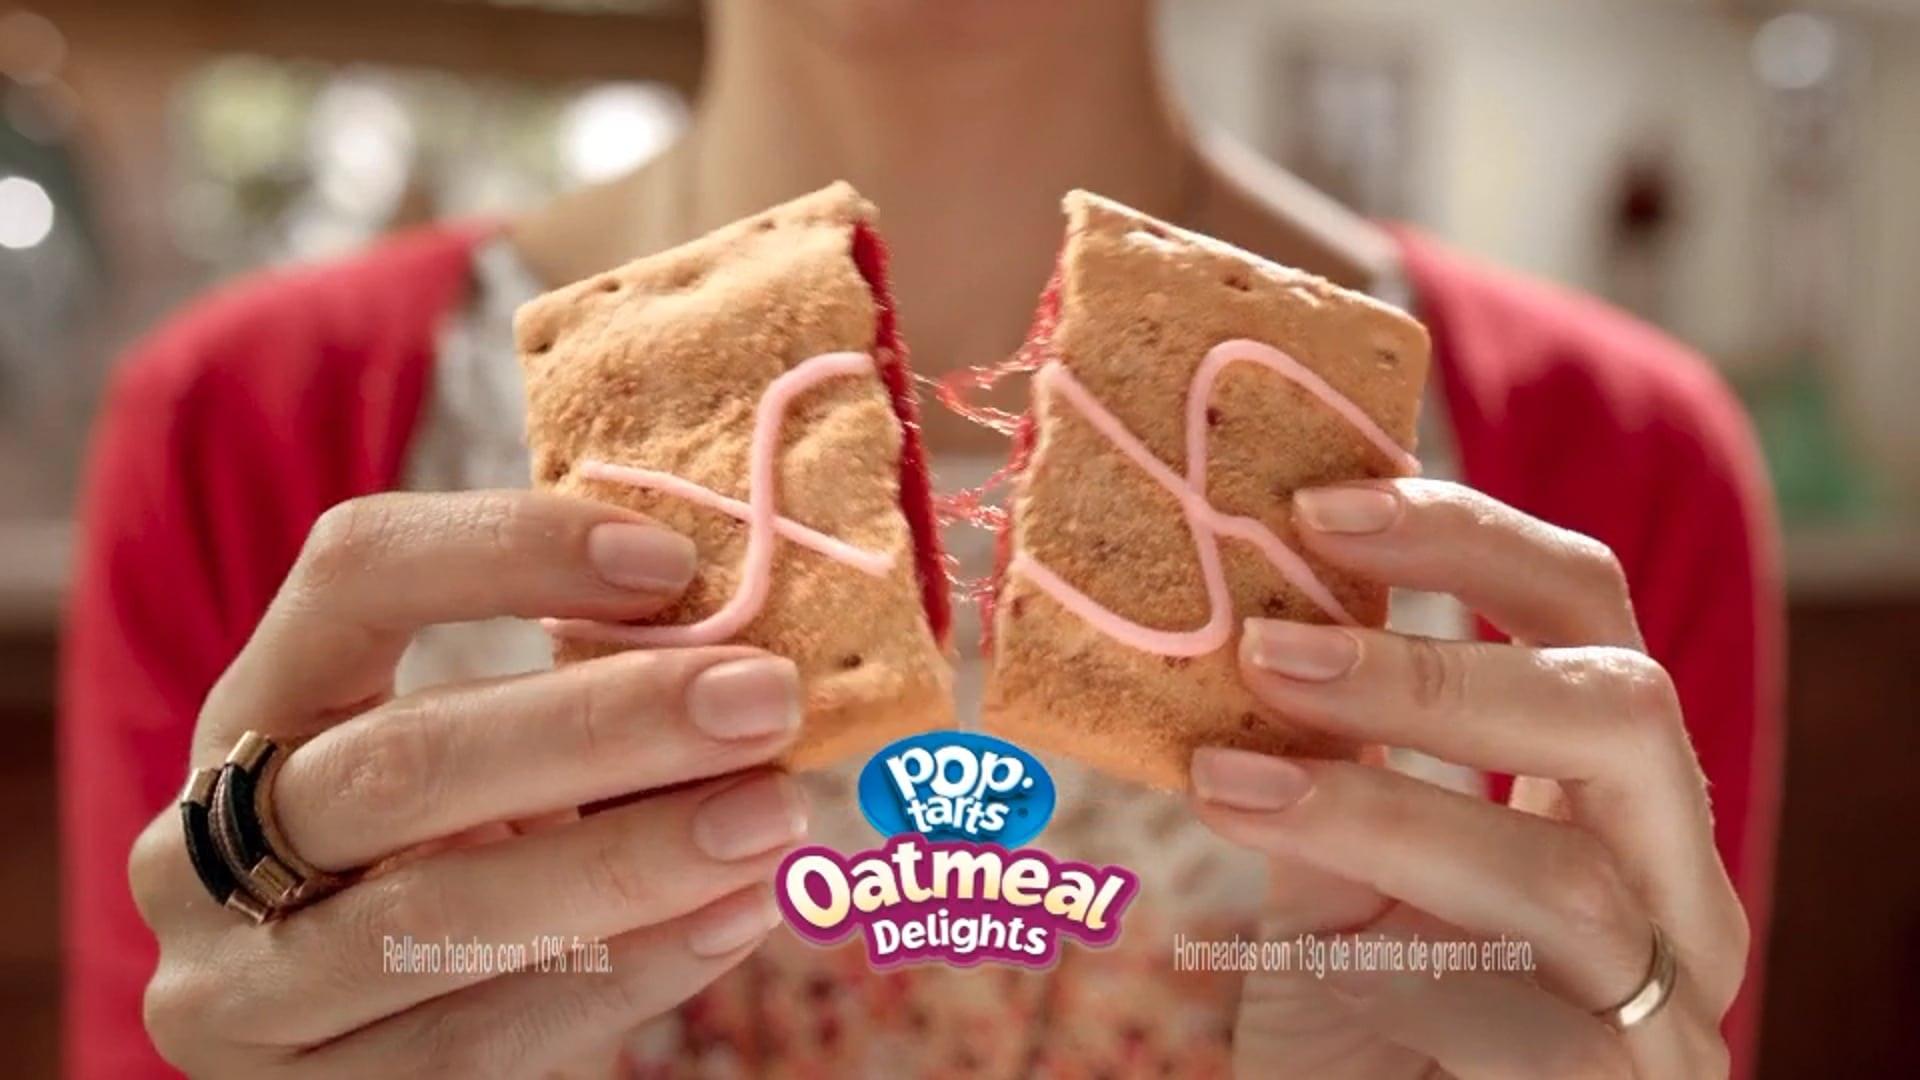 Kellogg's Pop Tarts - Oatmeal Delights